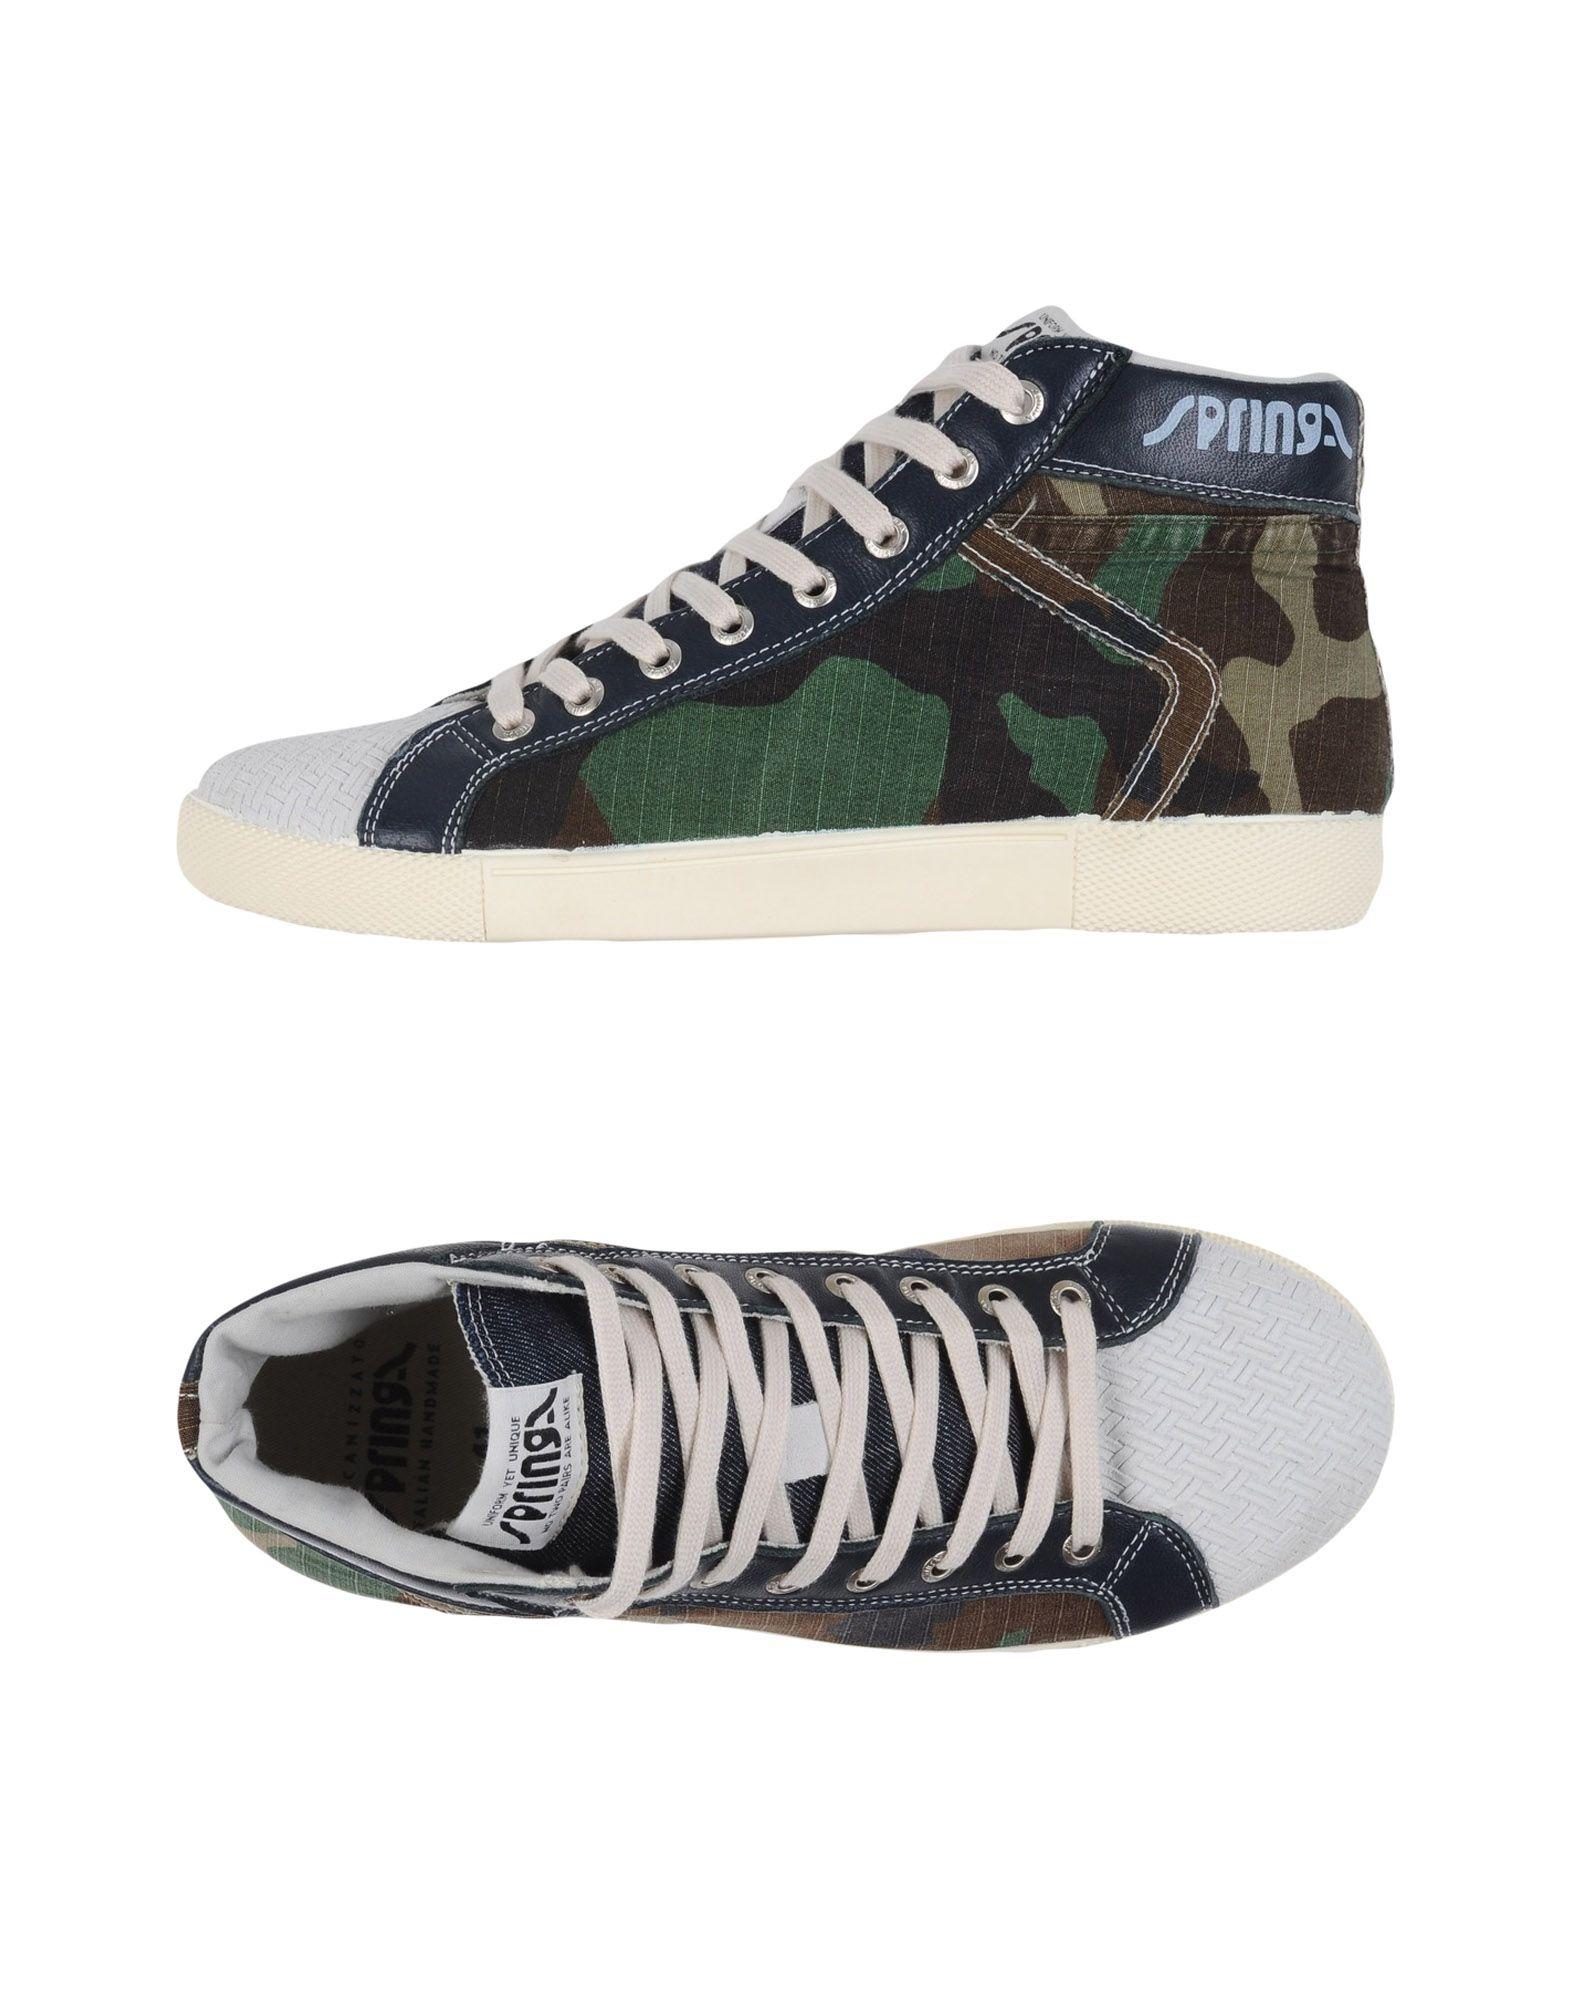 Springa Sneakers - Men Springa Sneakers online on 11169223JH  United Kingdom - 11169223JH on 0a3381